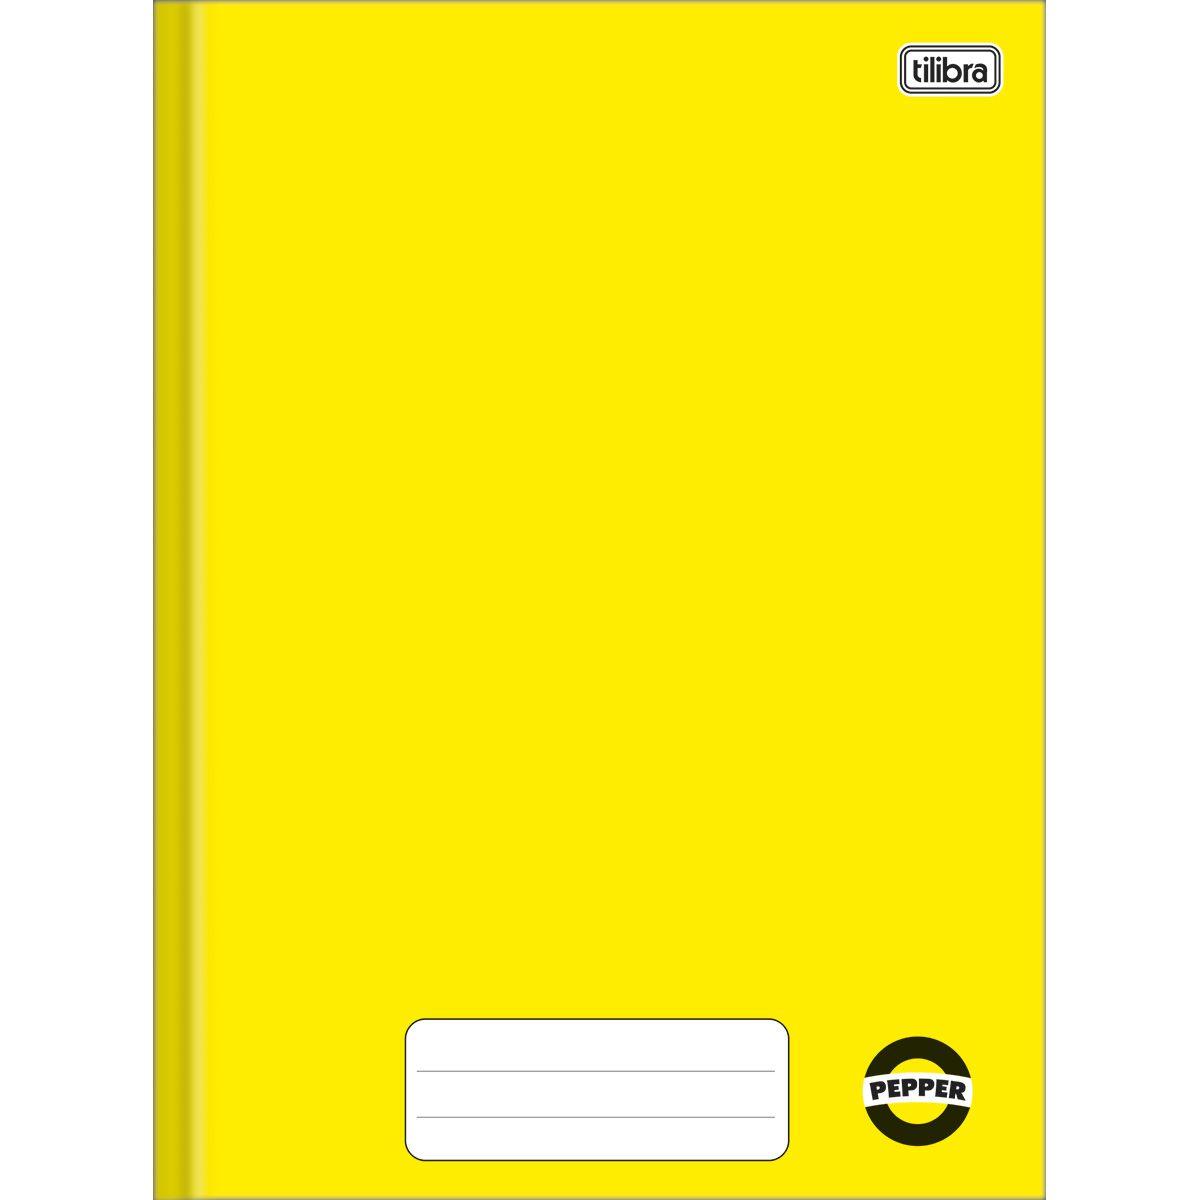 Caderno brochura 80 fls amarelo PEPPER Tilibra